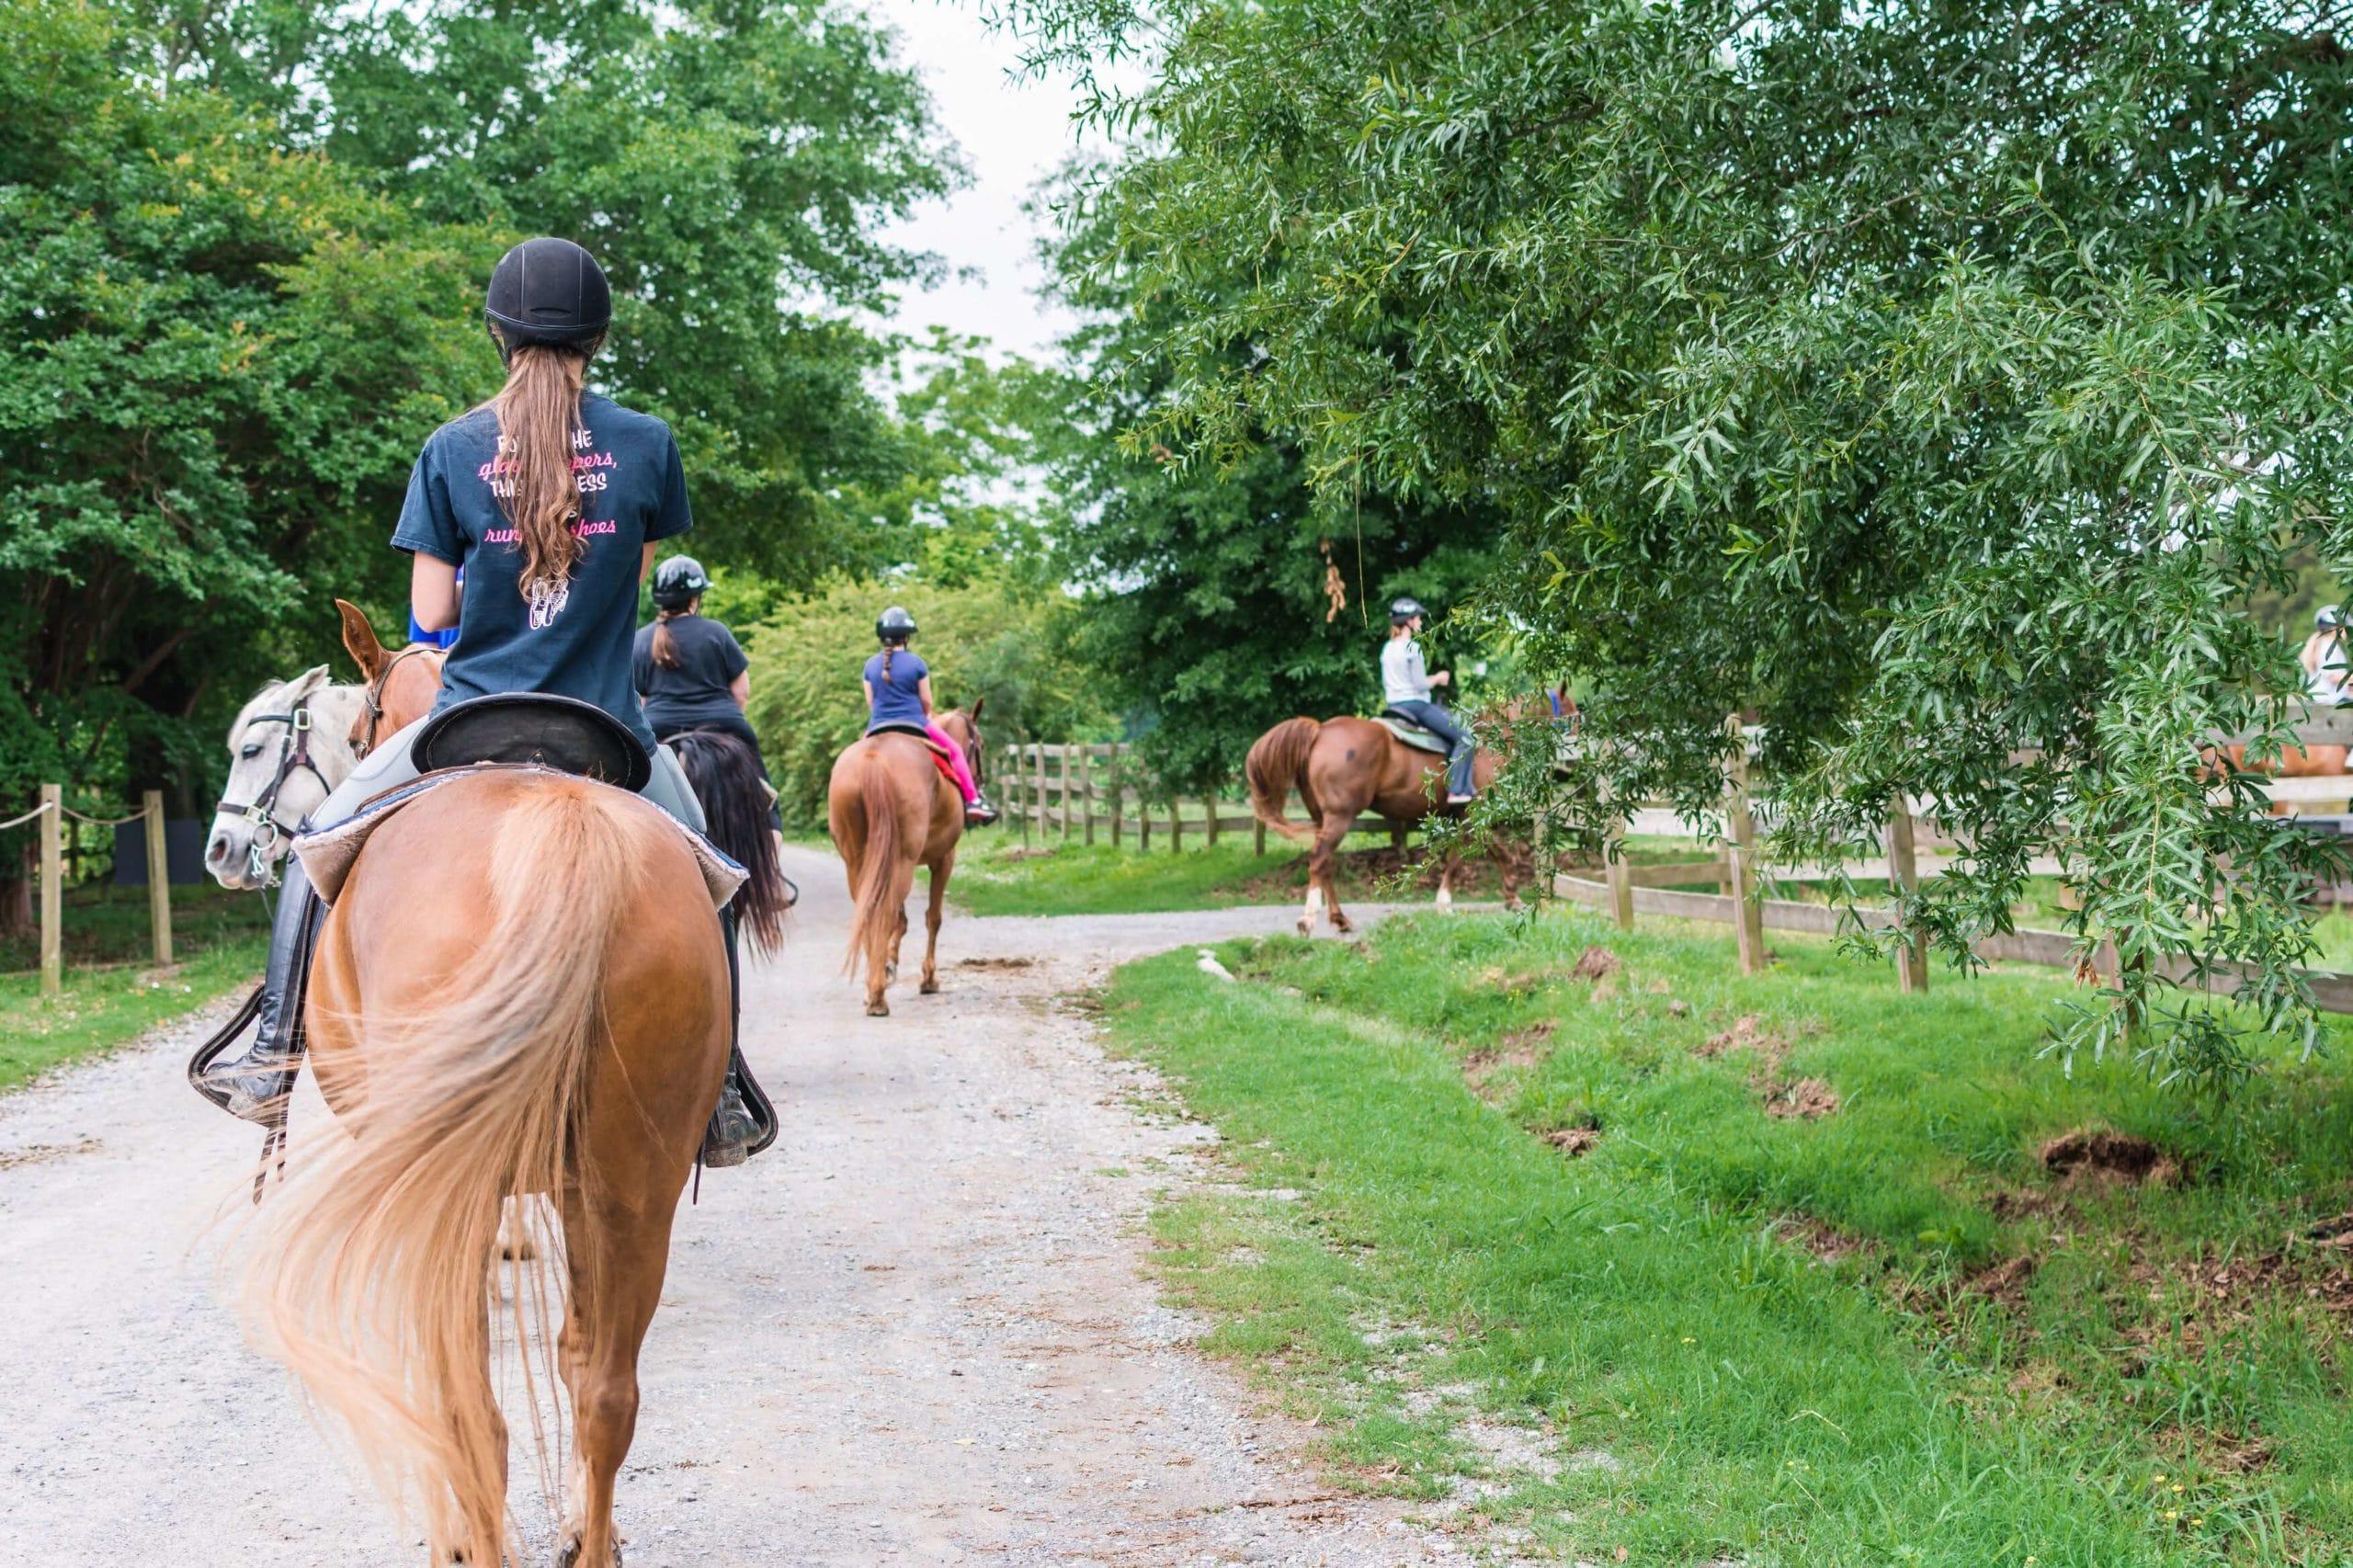 Girls riding horses down path